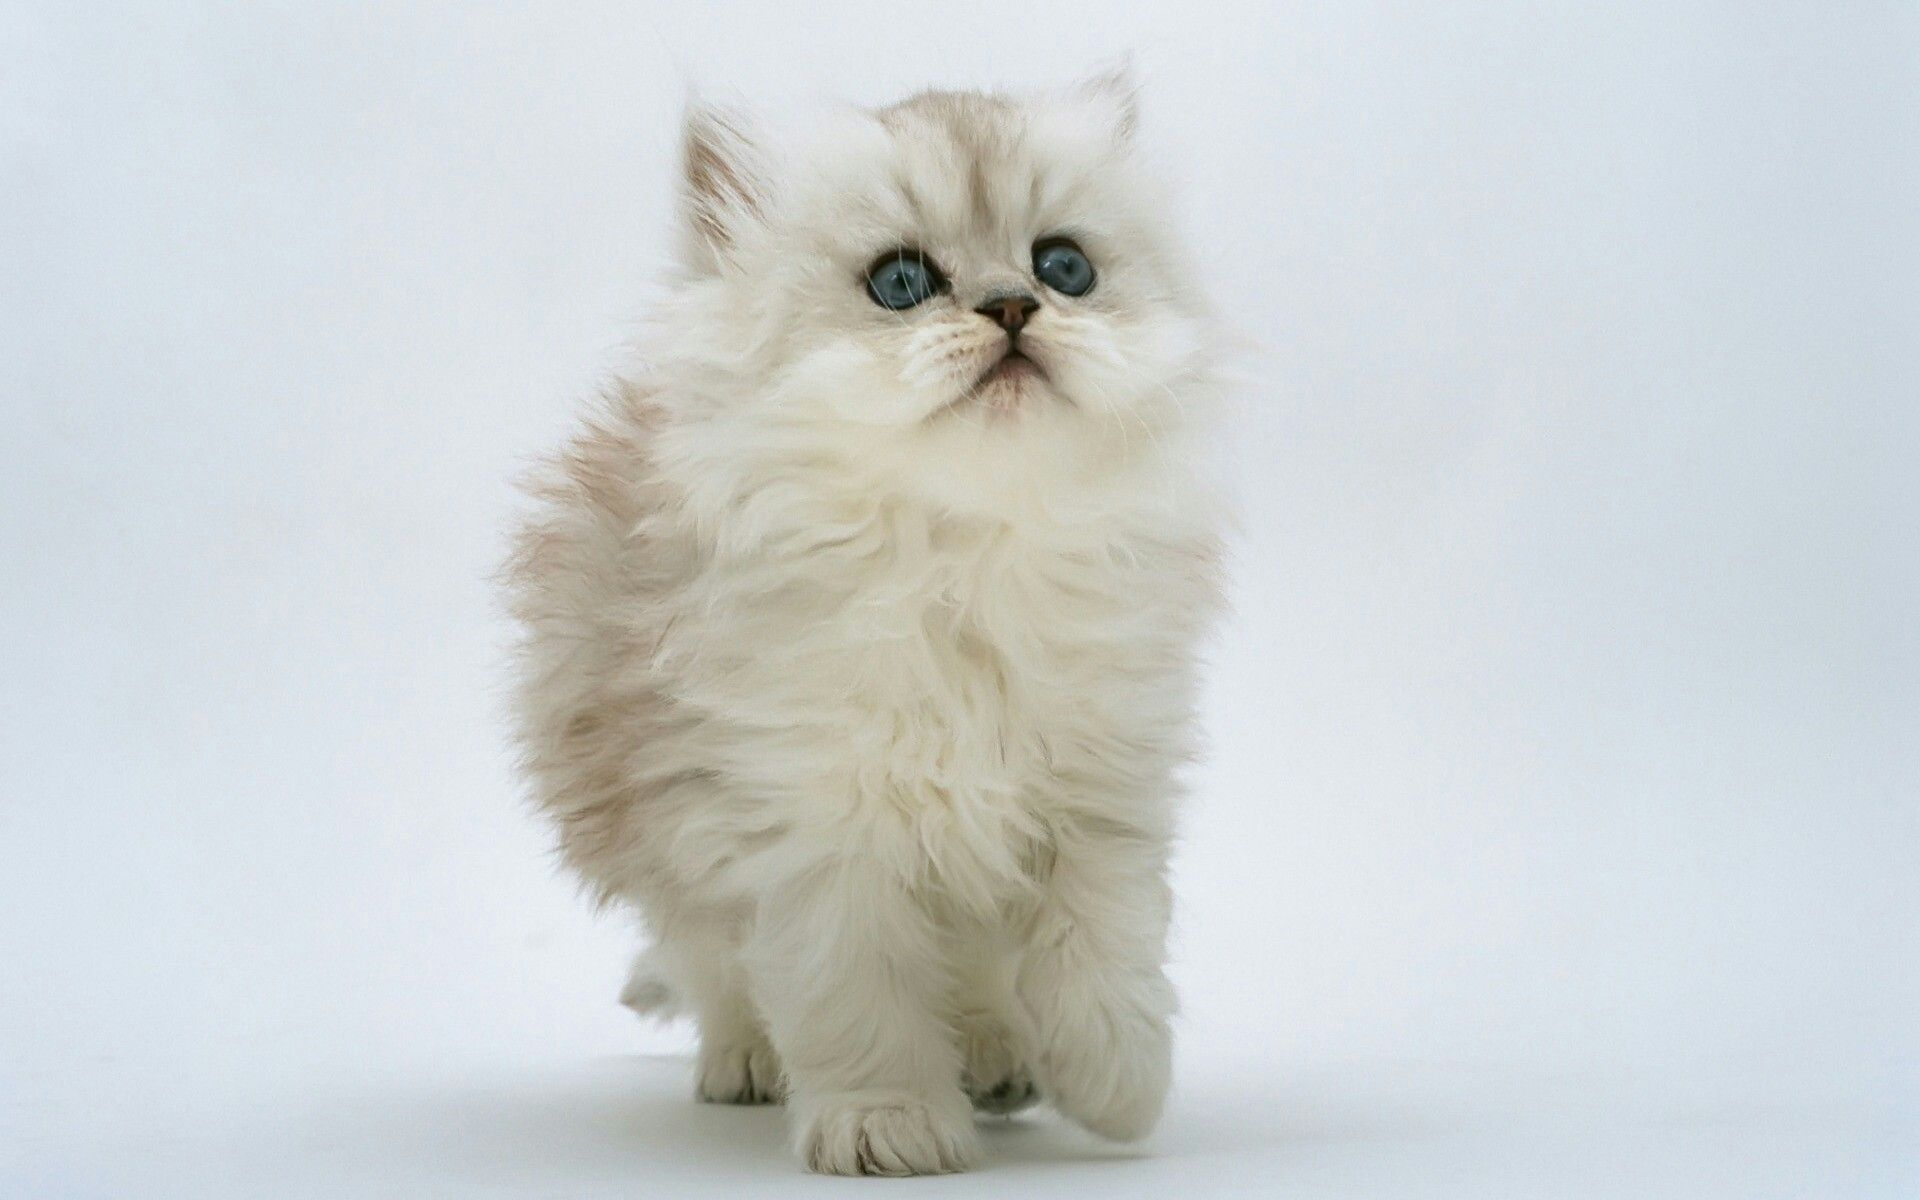 Pin By Veronique On Cell Scteen Kittens Cutest White Fluffy Kittens Kitten Wallpaper